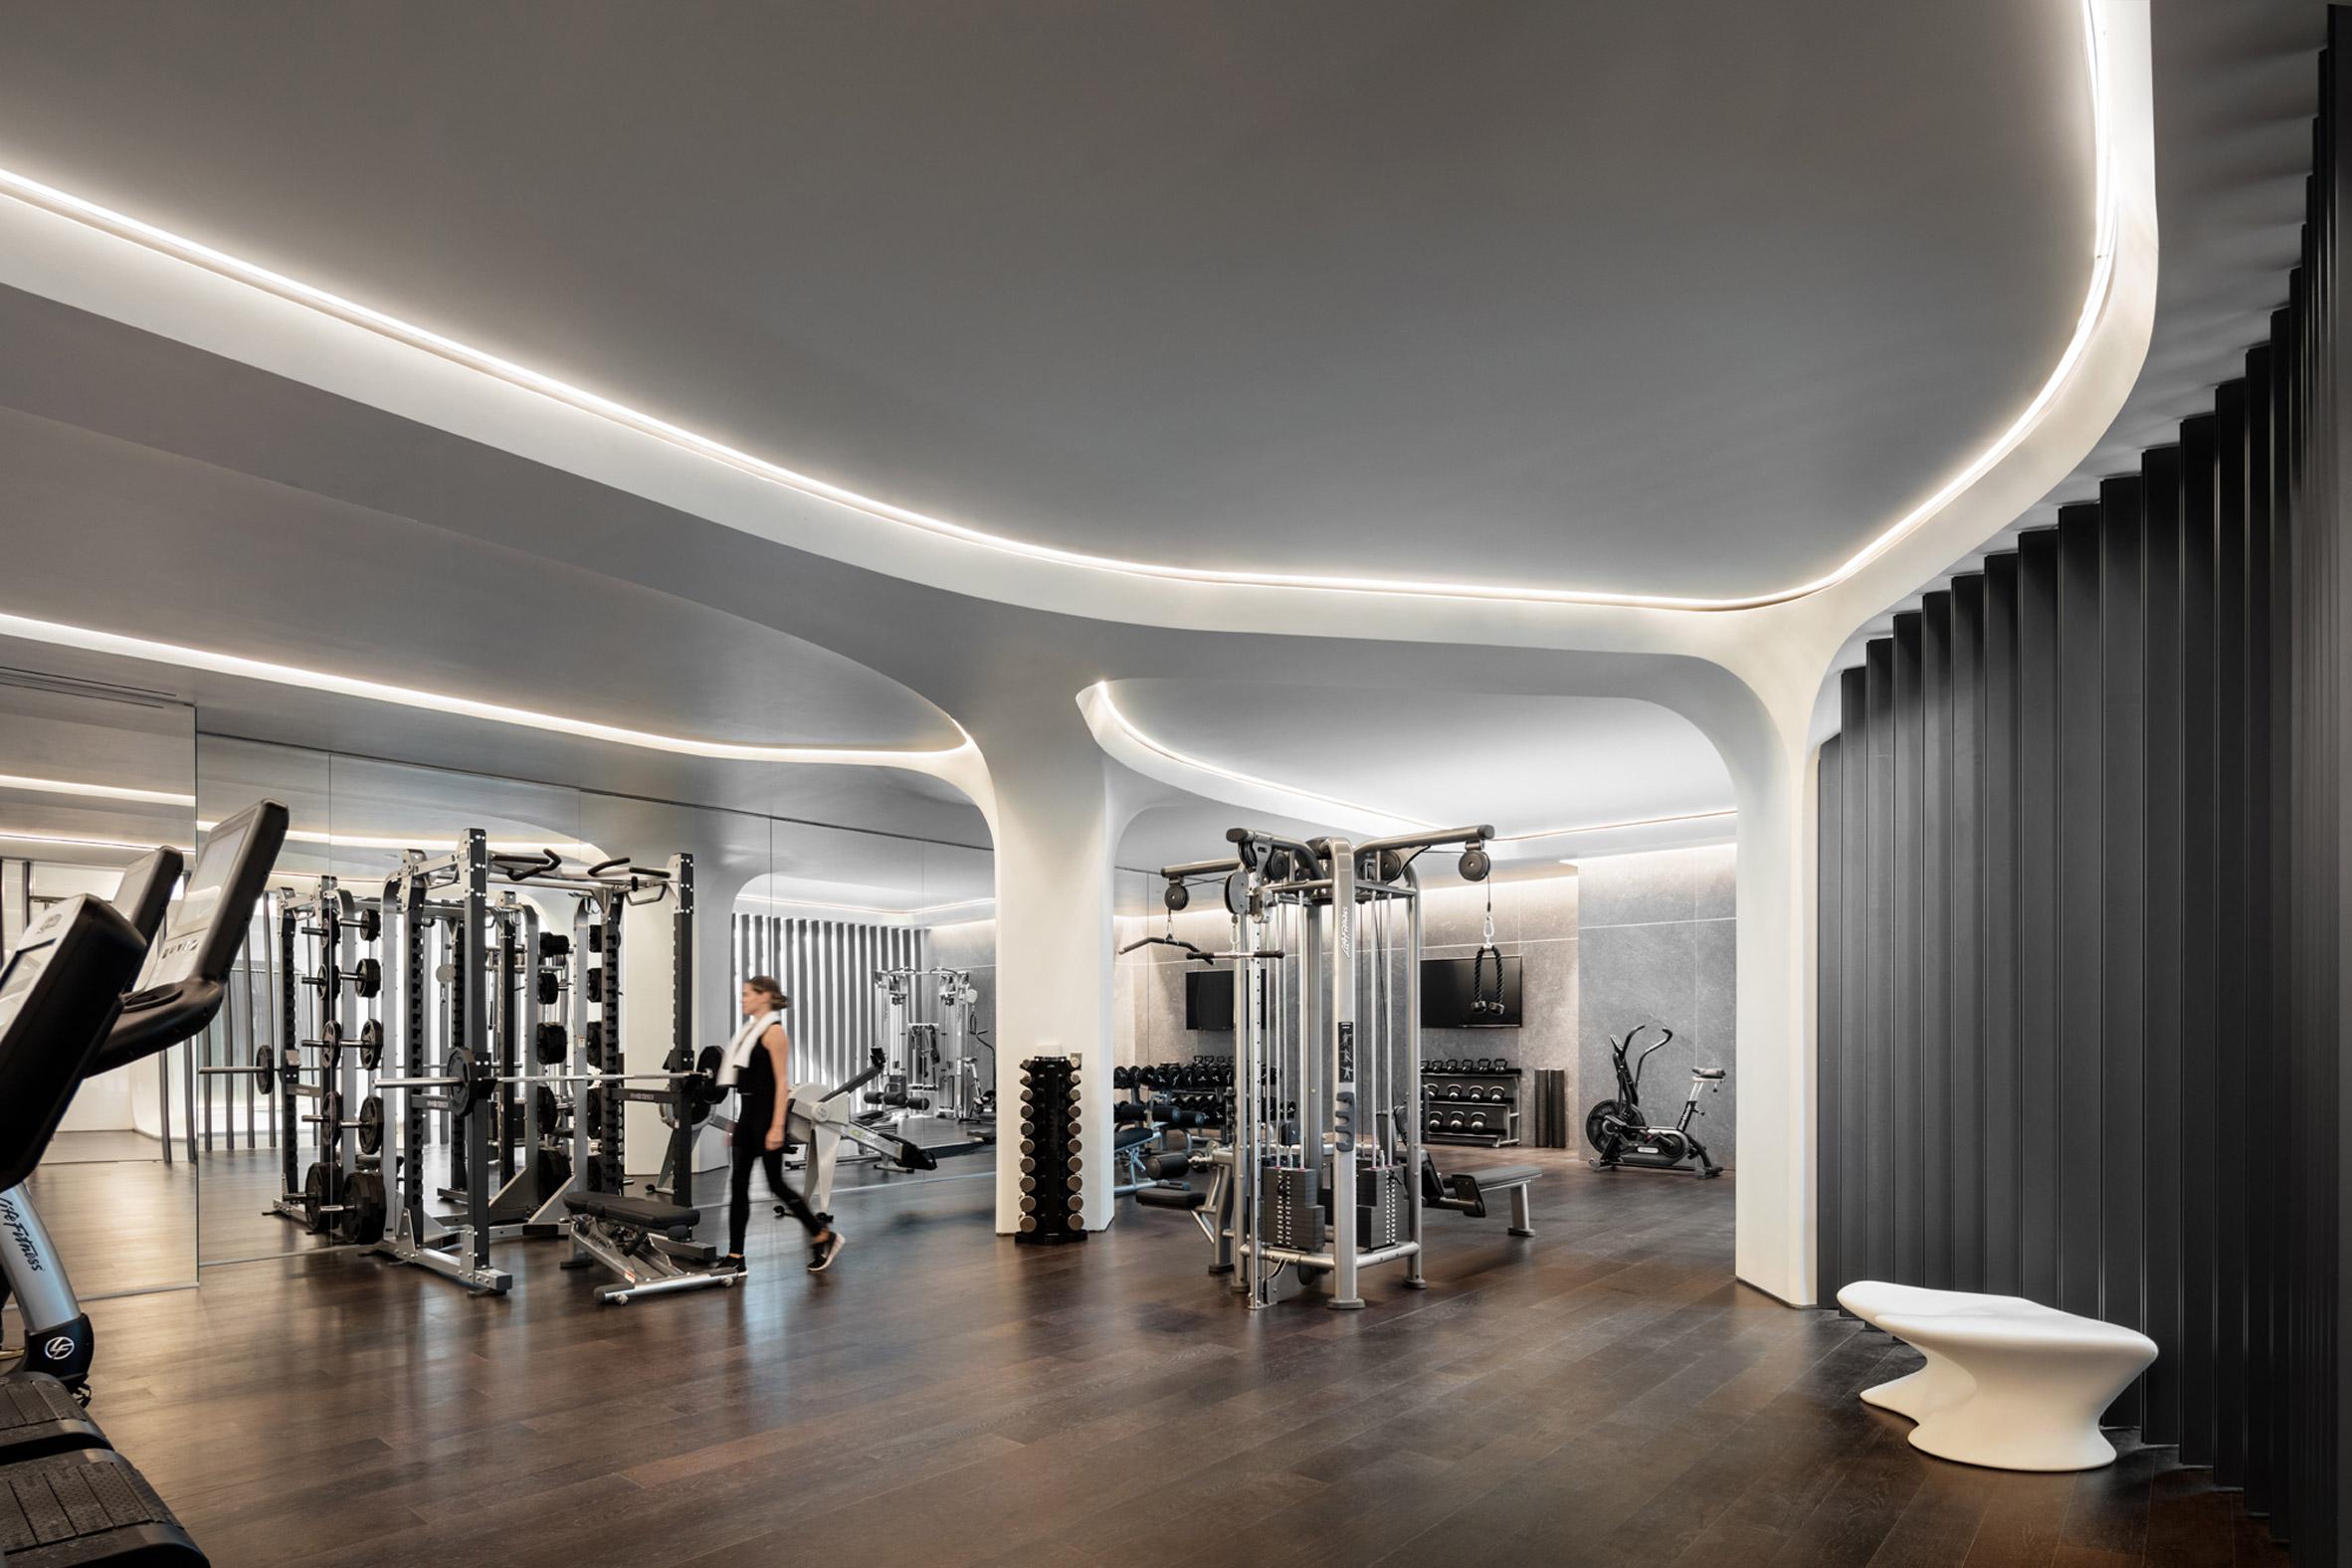 520 W 28th Amenities by Zaha Hadid Architects